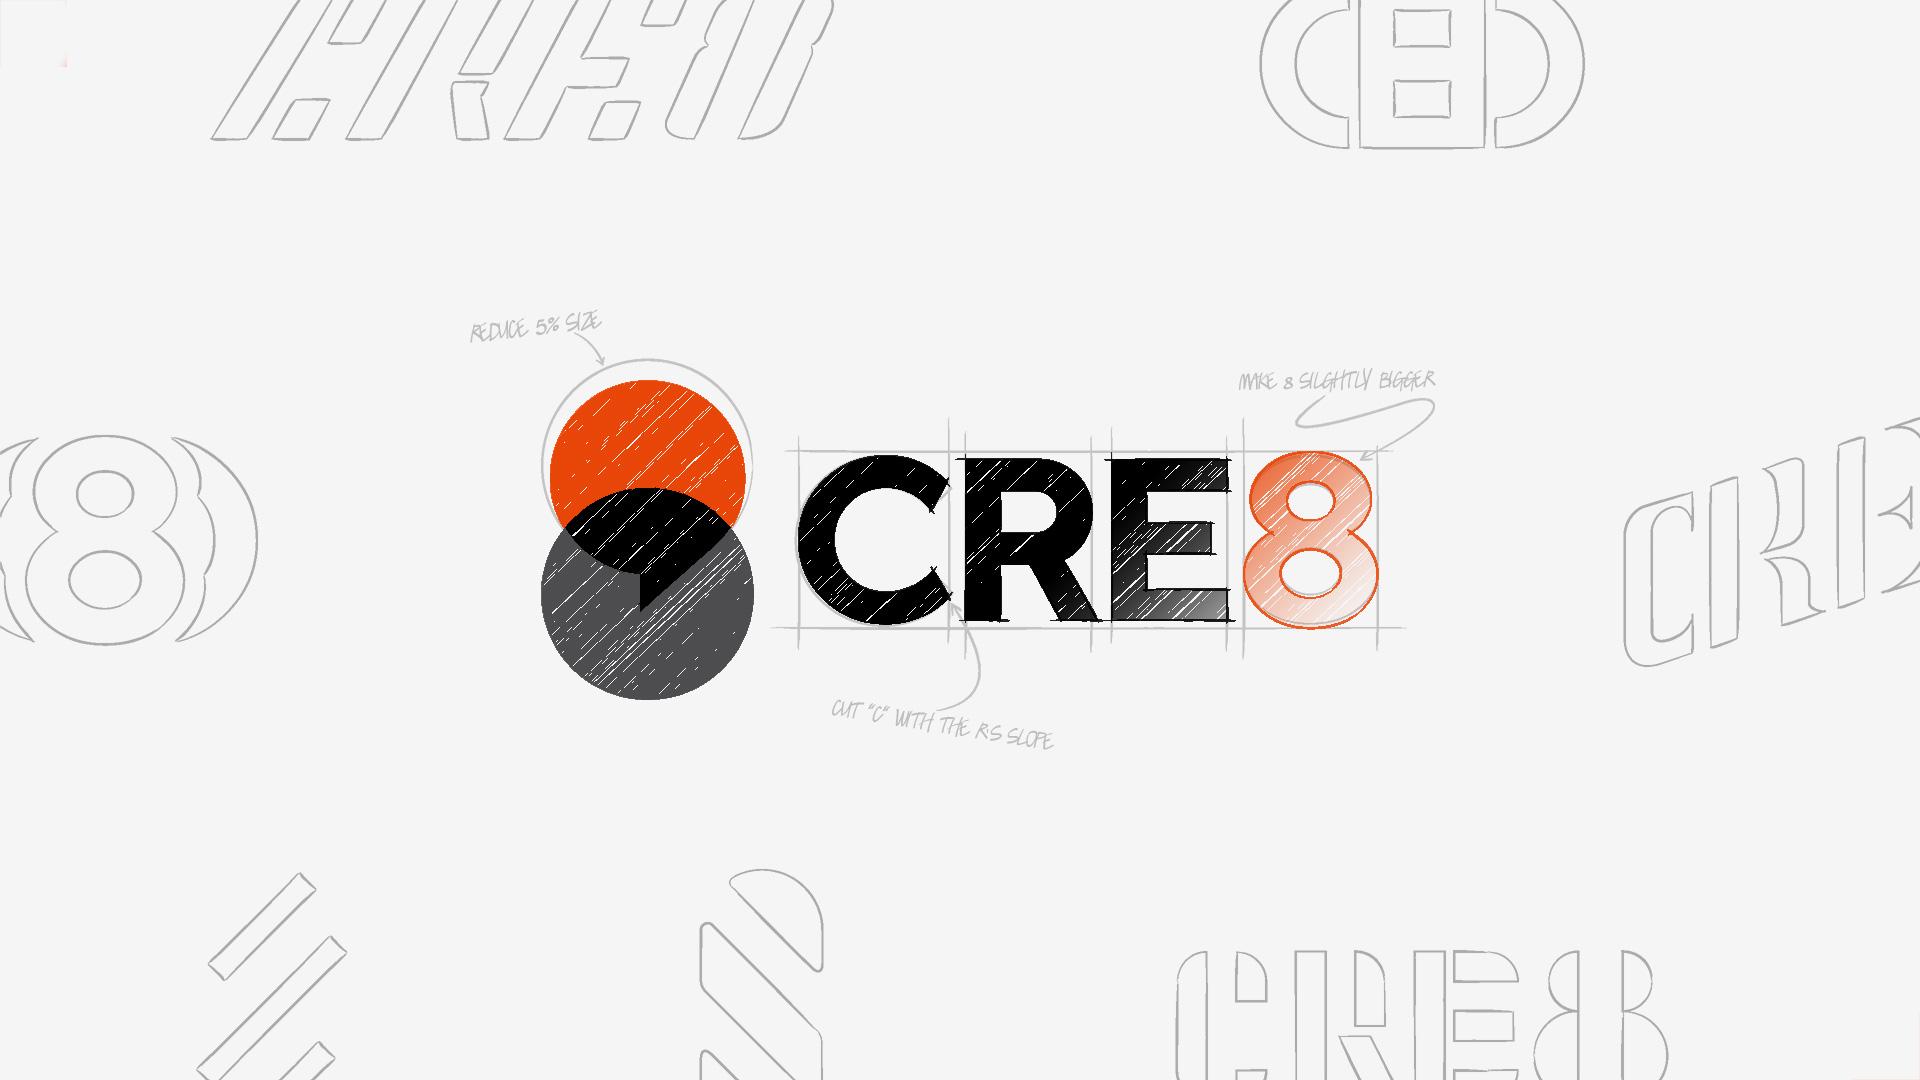 CRE8-CS_Pic-3_1980X1020